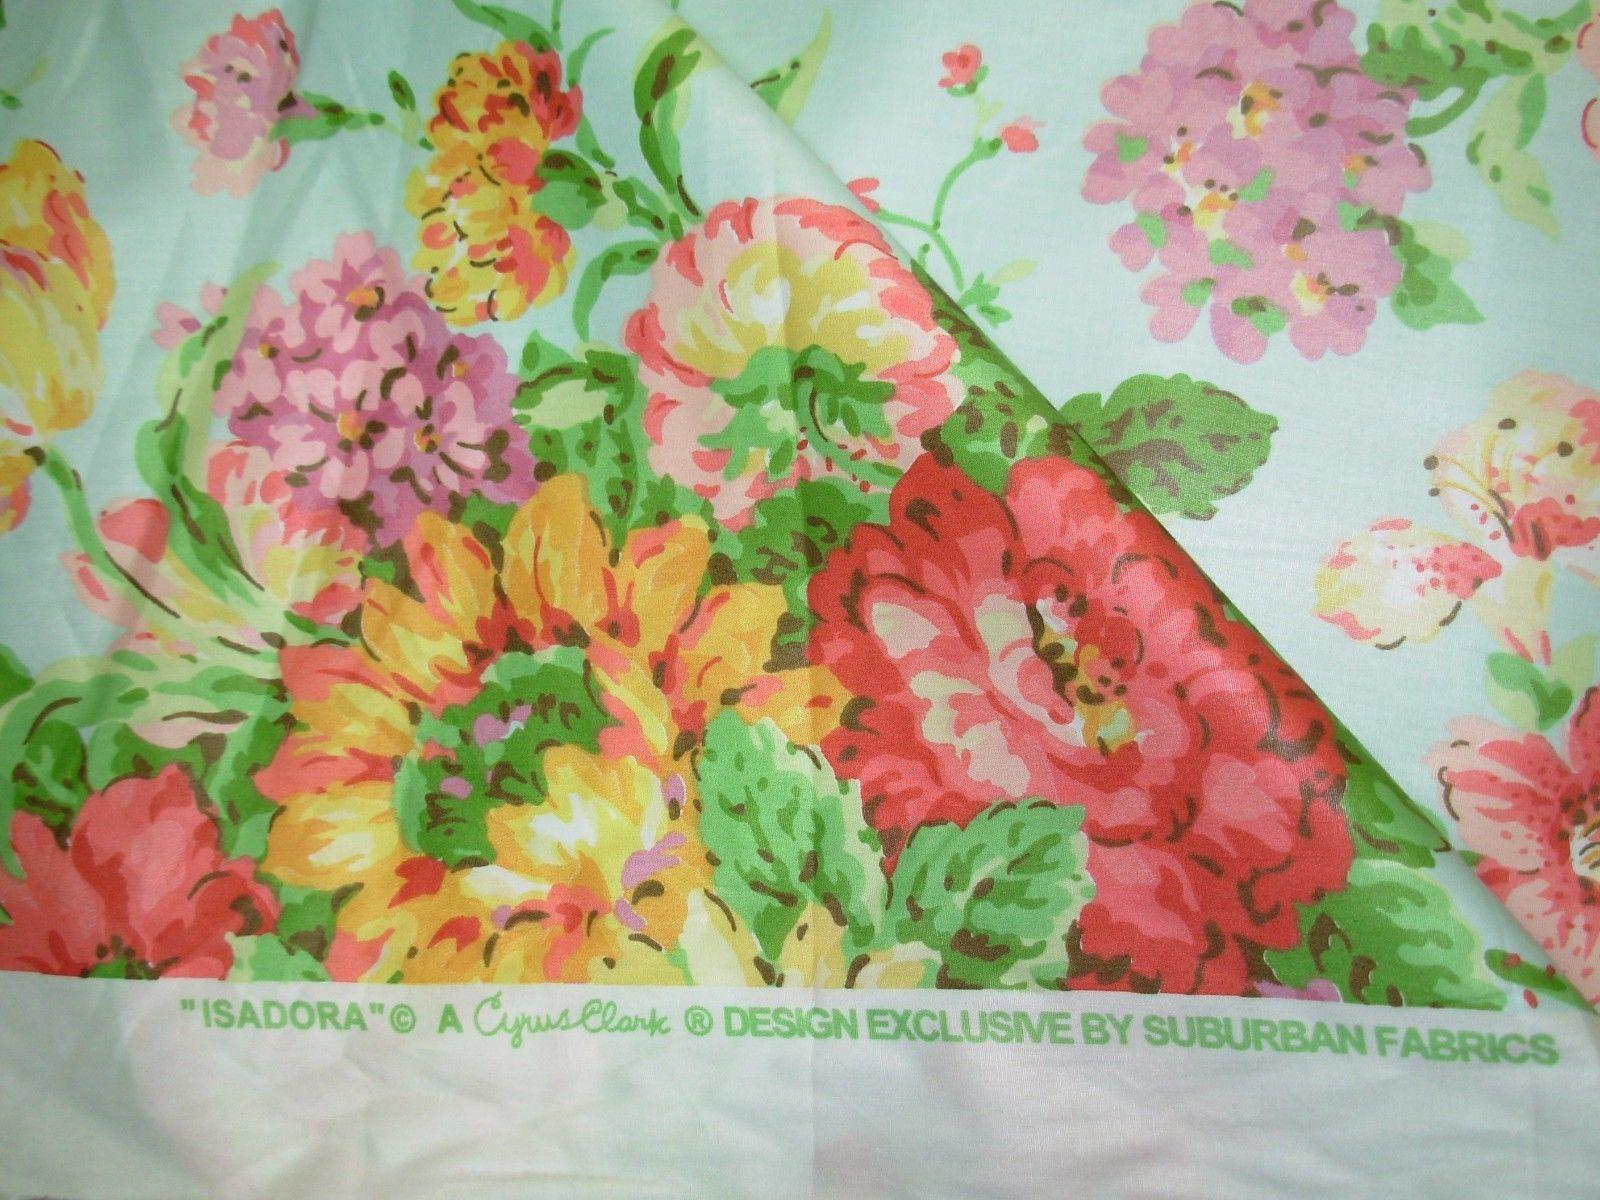 White beach print home decor fabric decorative seashell bty ebay -  18 Suburban Cyrus Clark Isadora Glazed Cotton Upholstery Fabric For